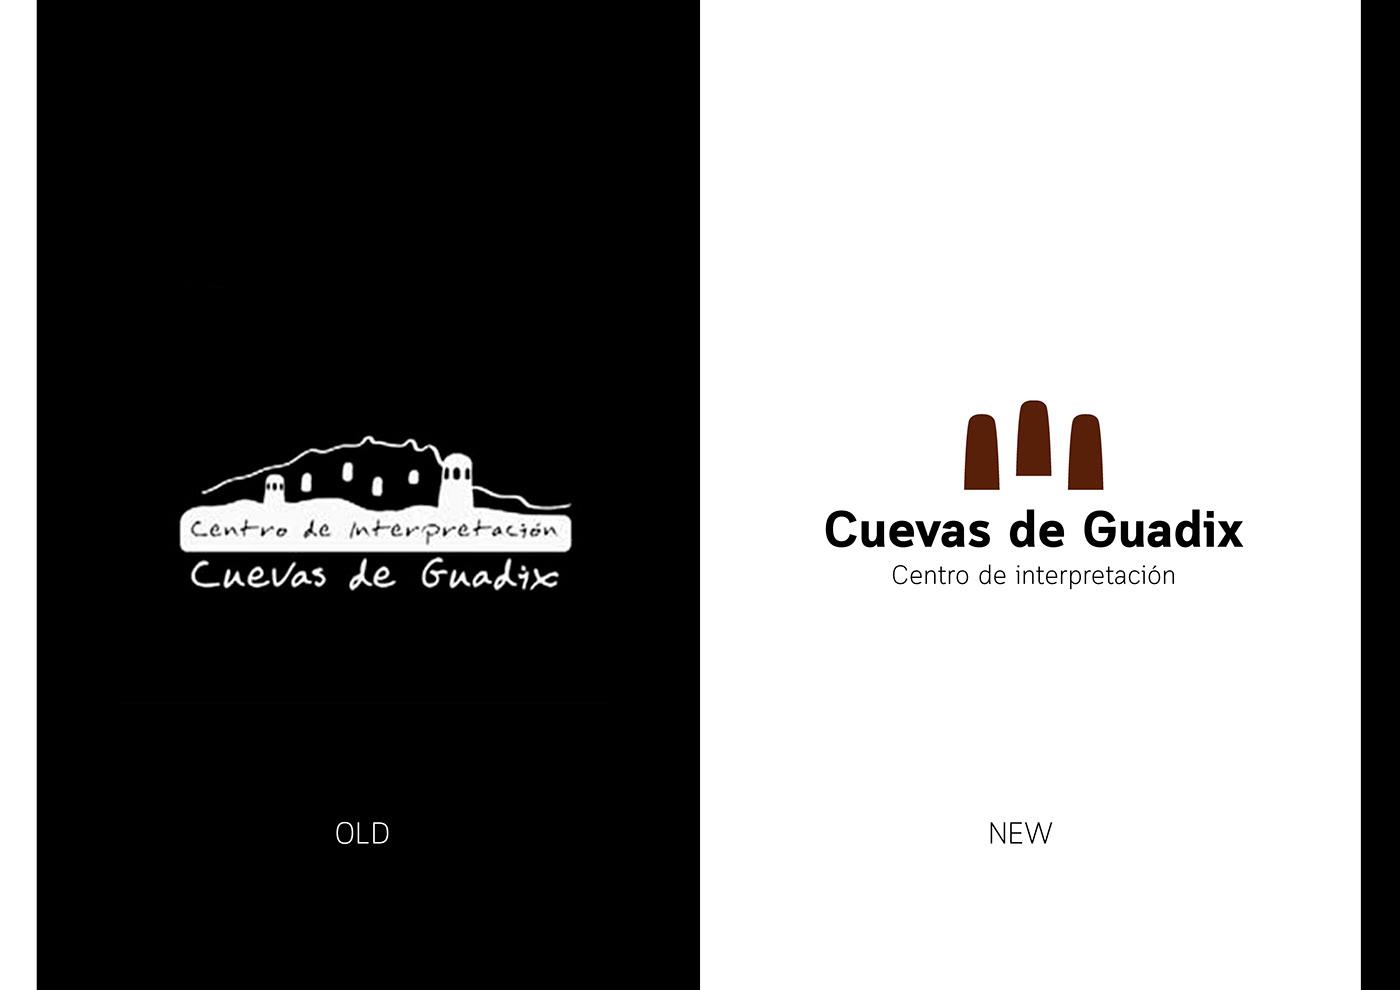 guadix cuevas Rebrand brand marcas Cuevas de Guadix Accitano granada